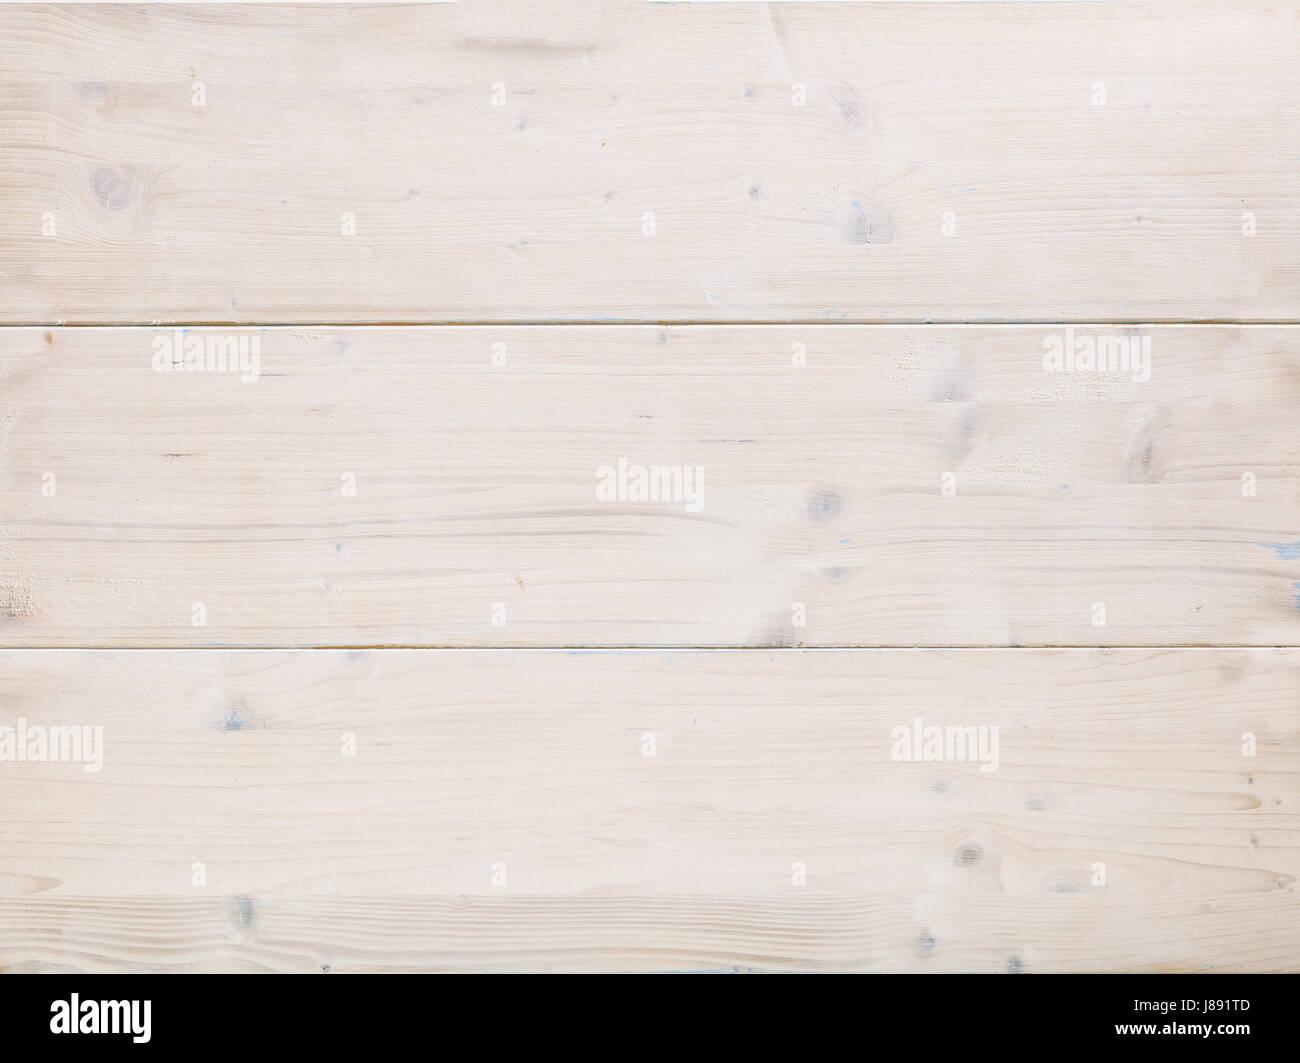 White wooden horizontal planks texture as background - Stock Image